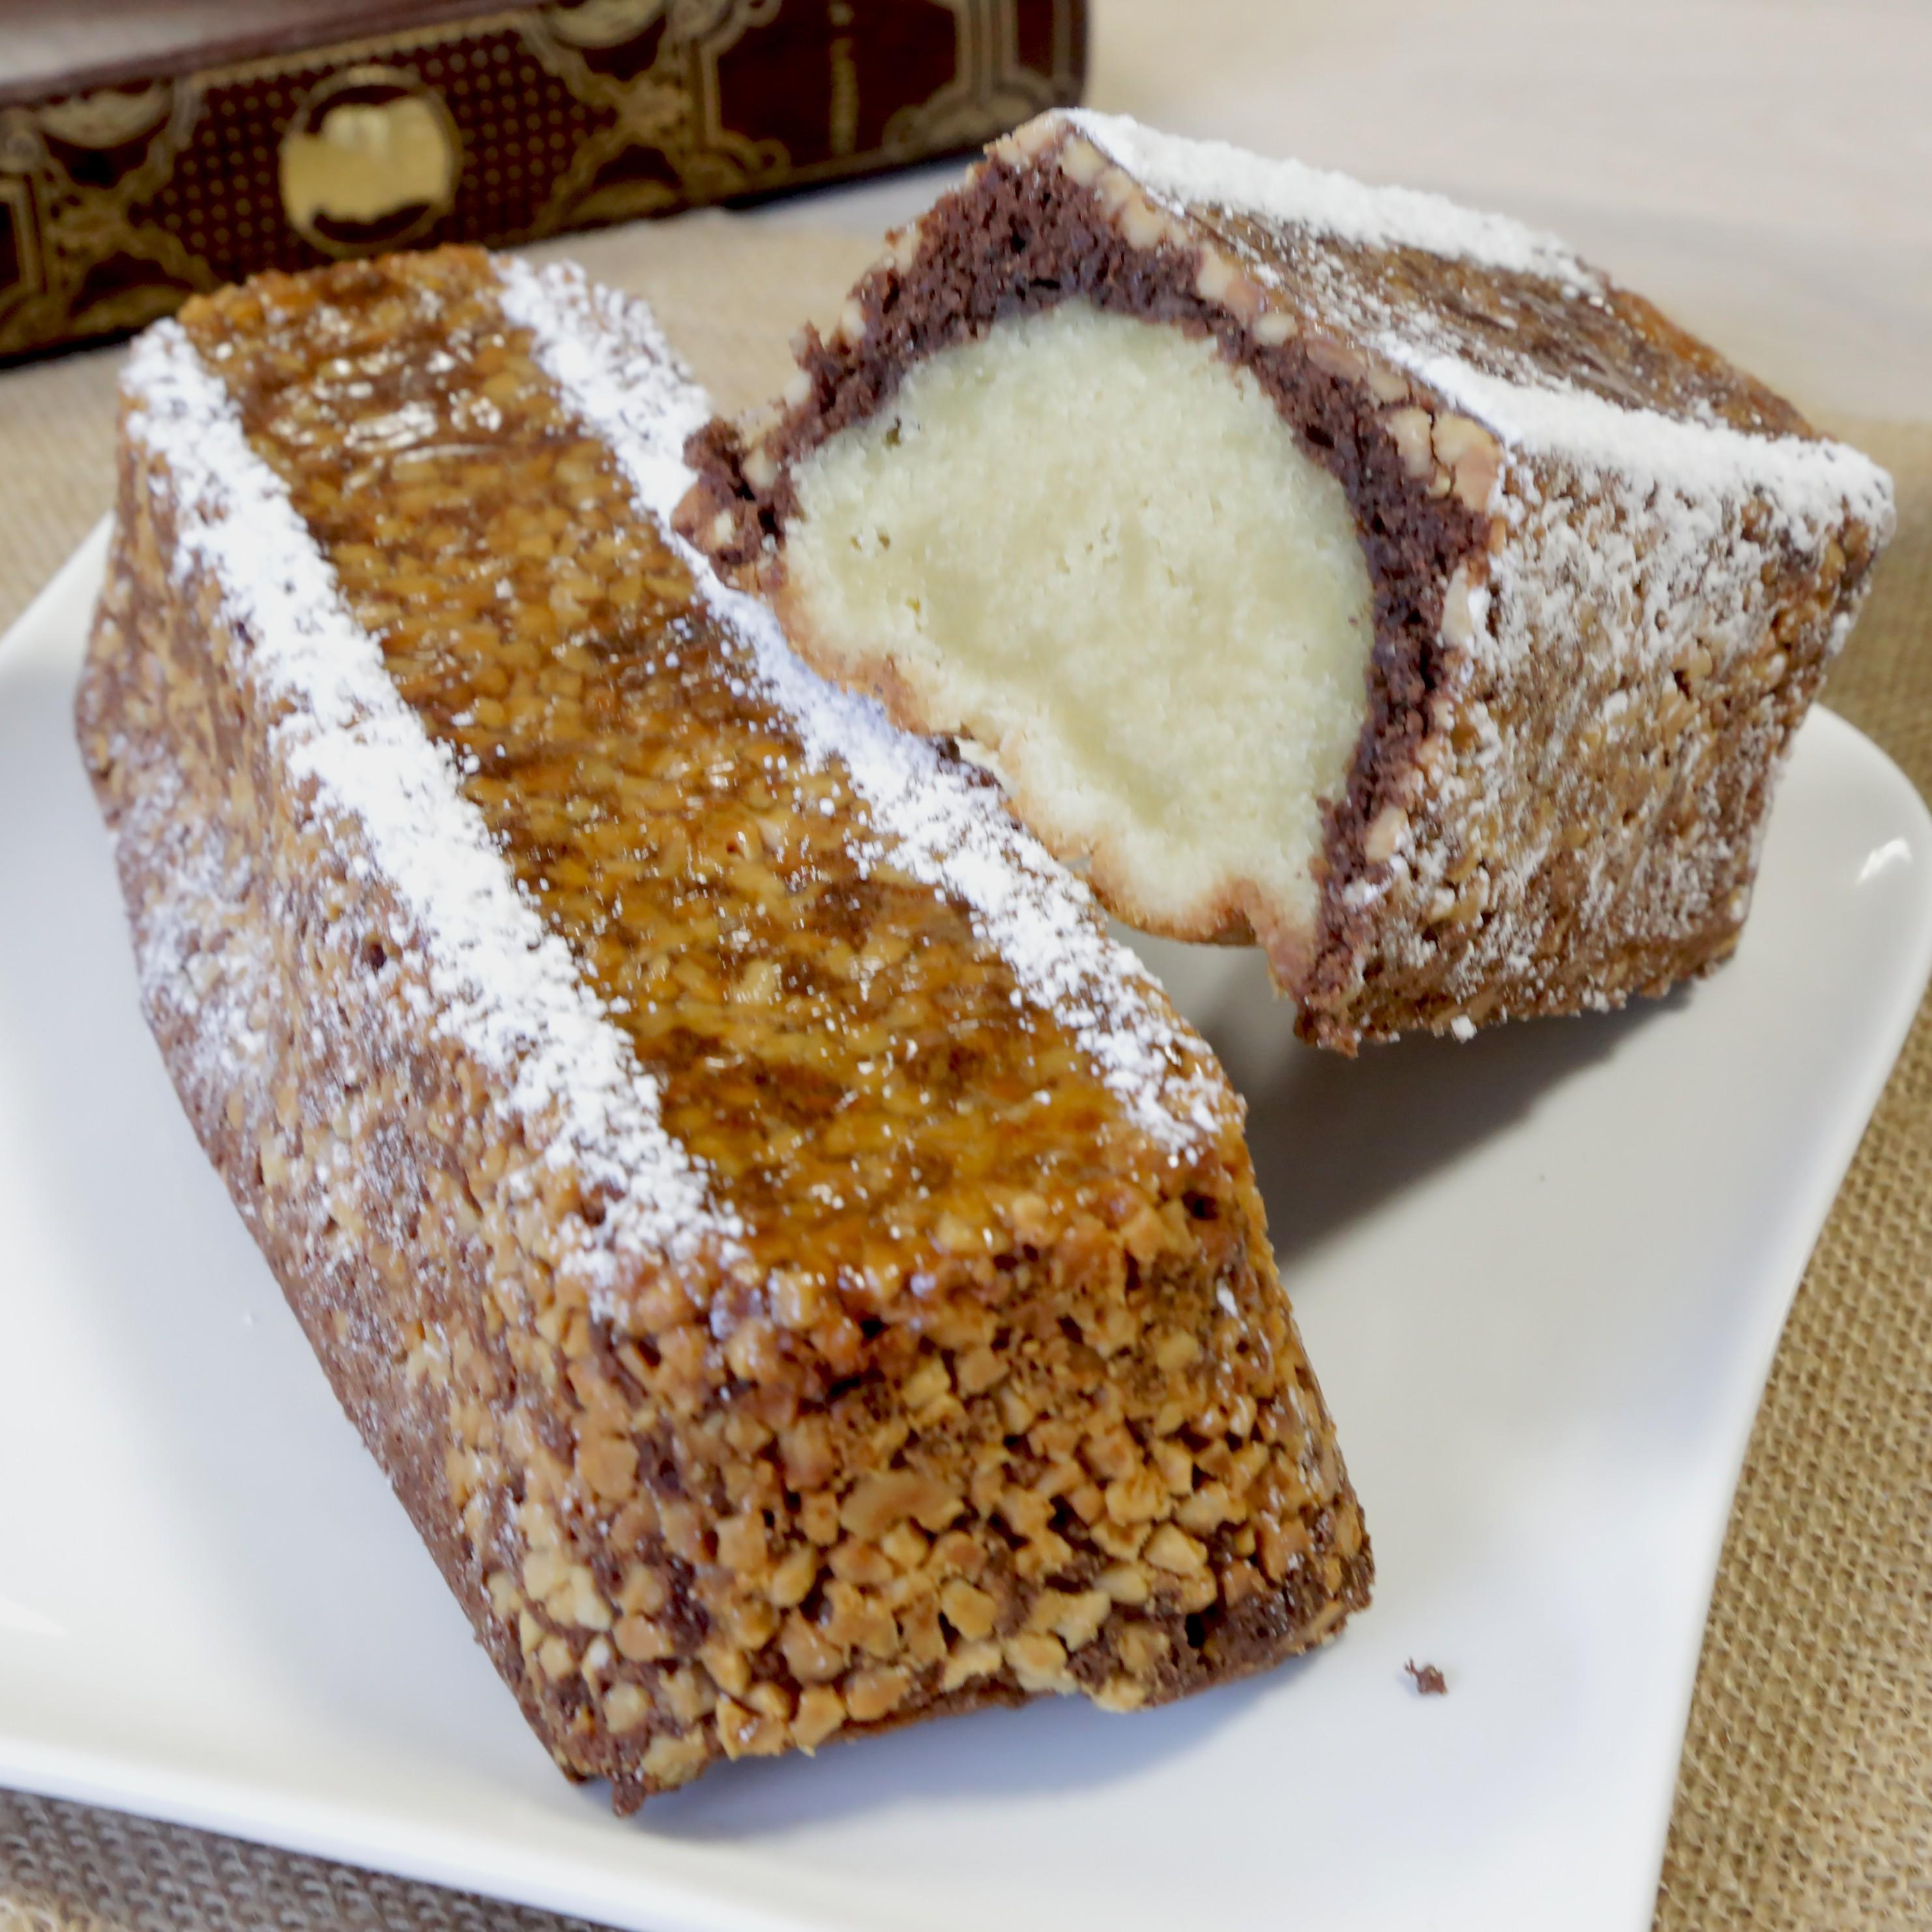 Recette de gâteau irlandais